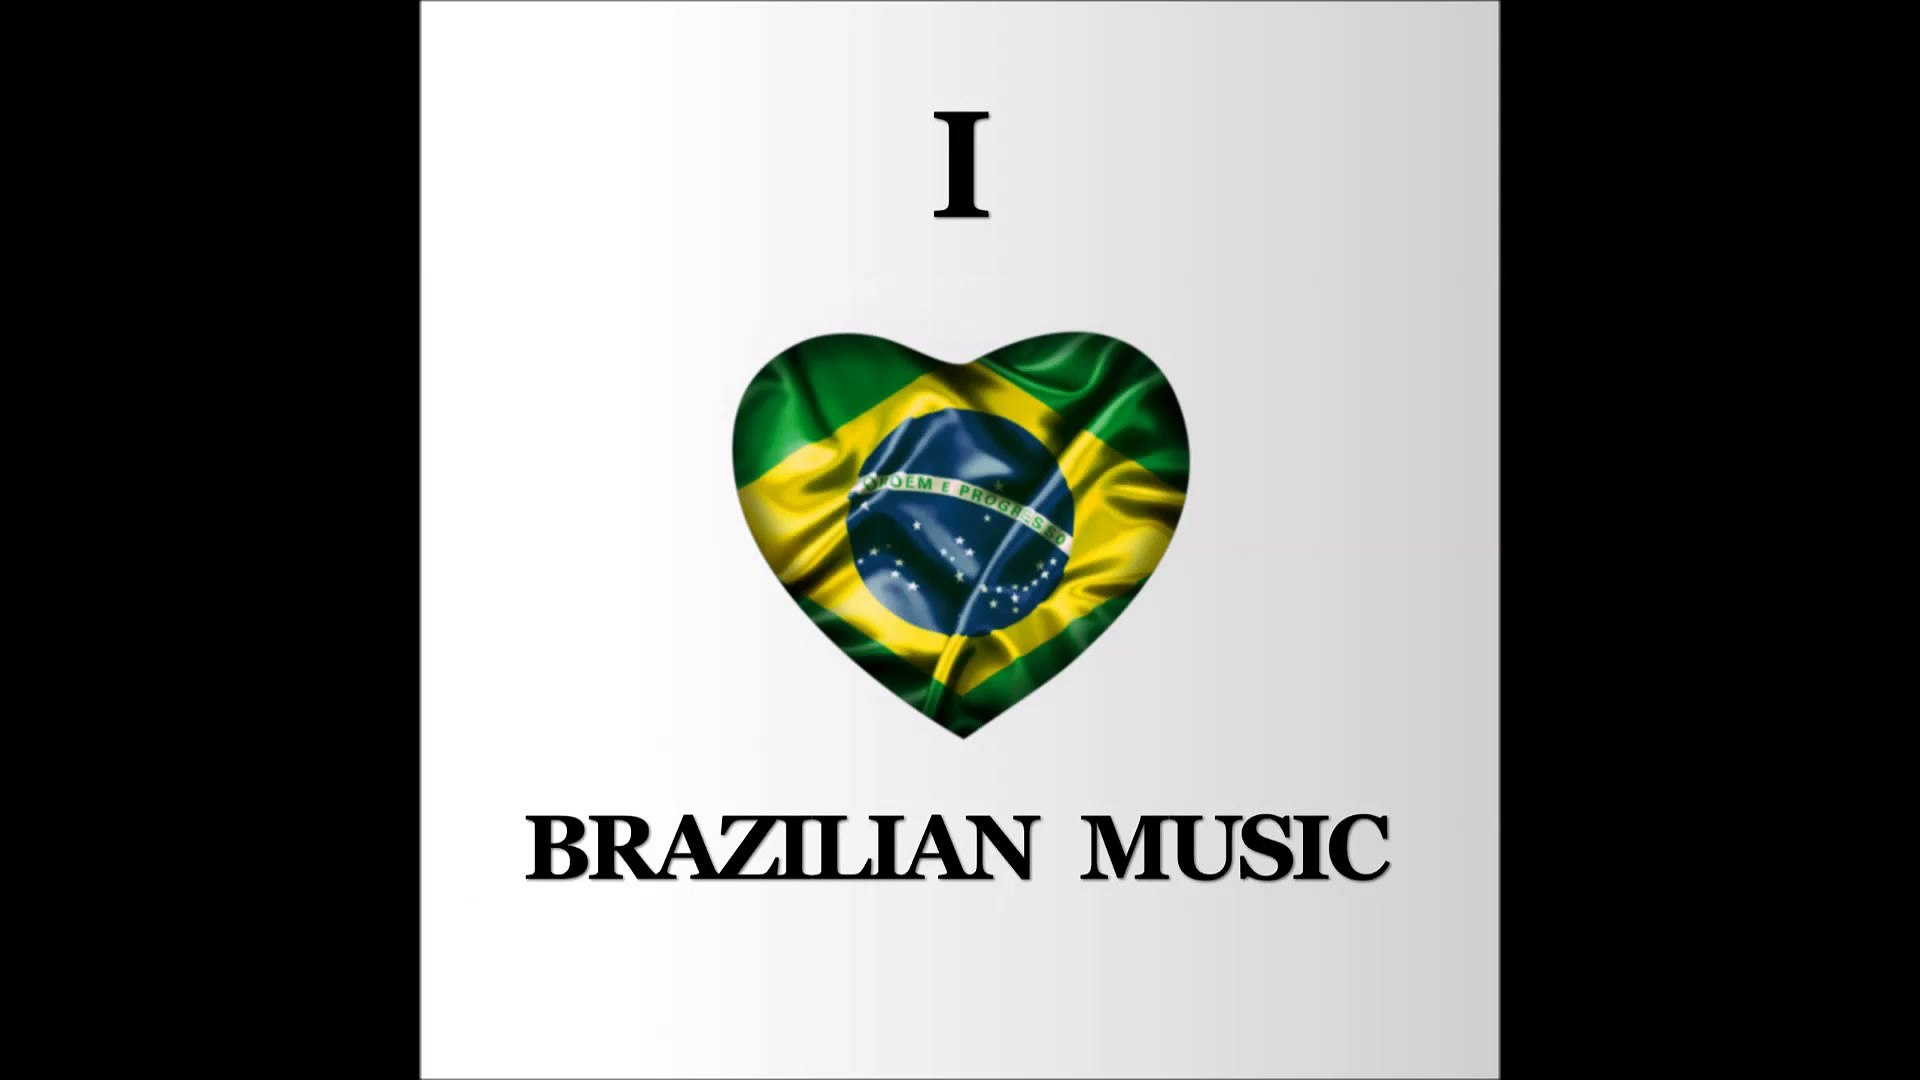 Bando de Macambira - Carinhoso - I Love Brazilian Music